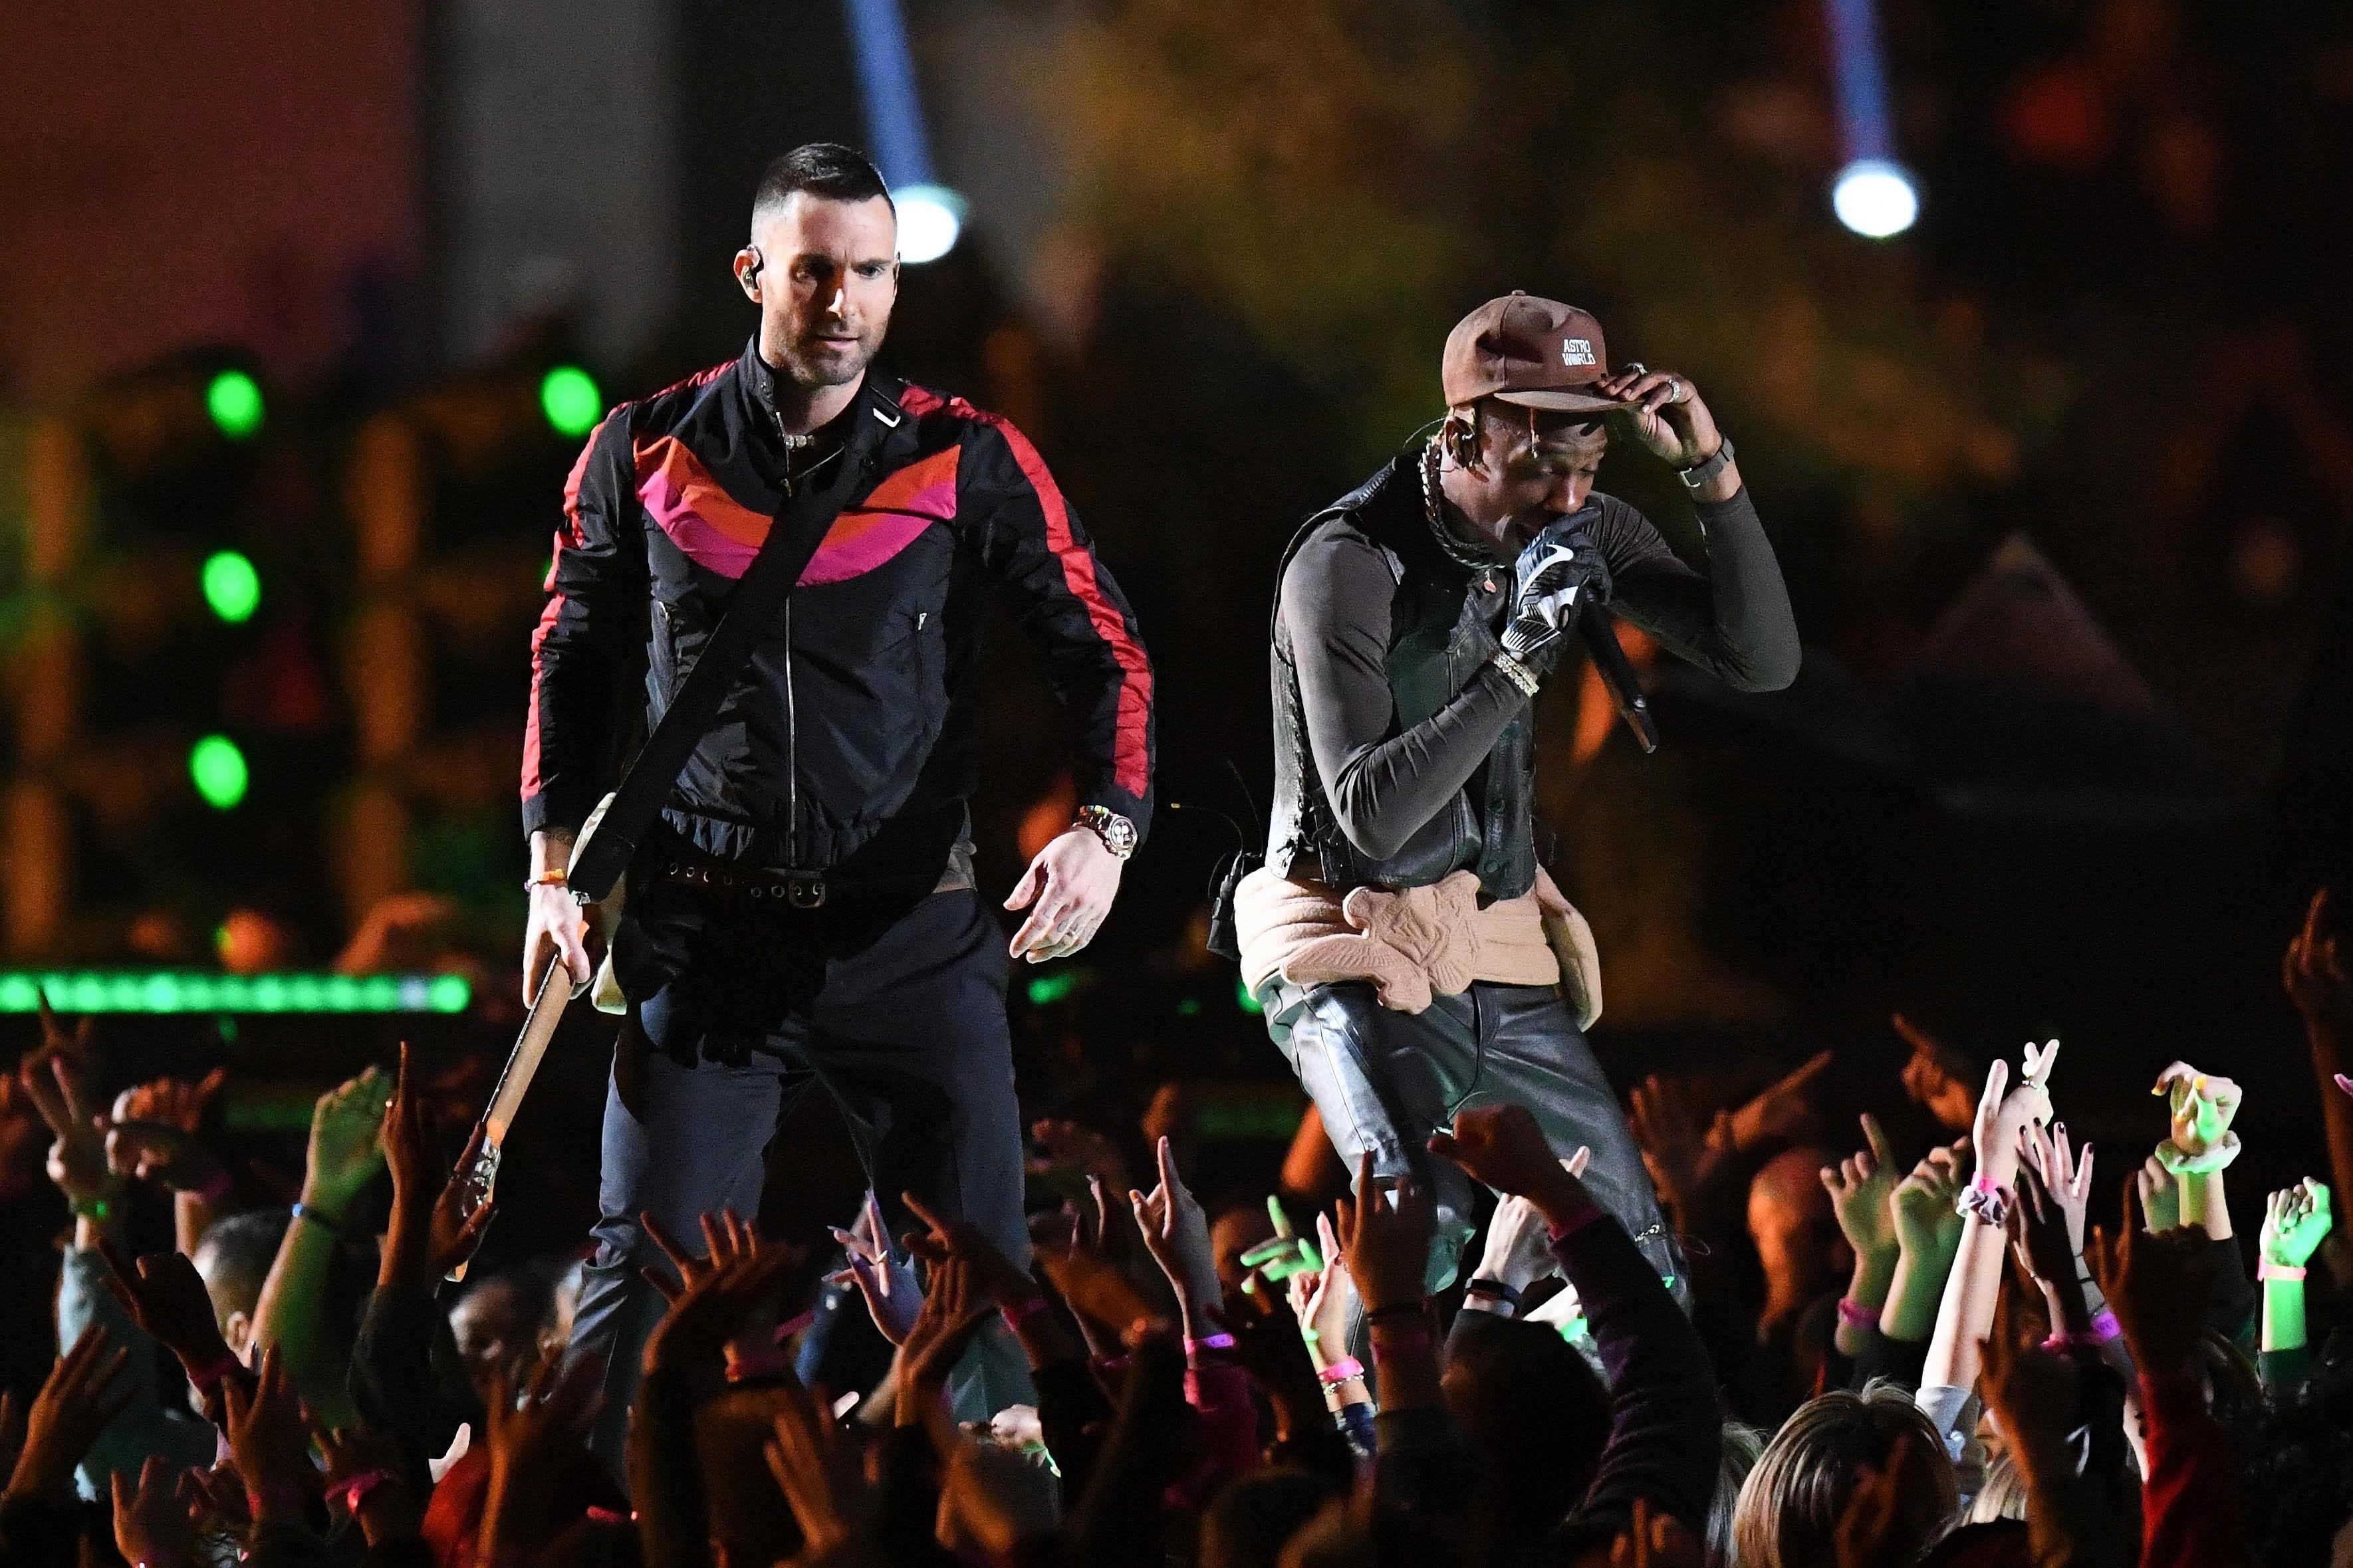 Super Bowl Halftime Show – Maroon 5 And Shirtless Adam with regard to Maroon 5 Travis Scott